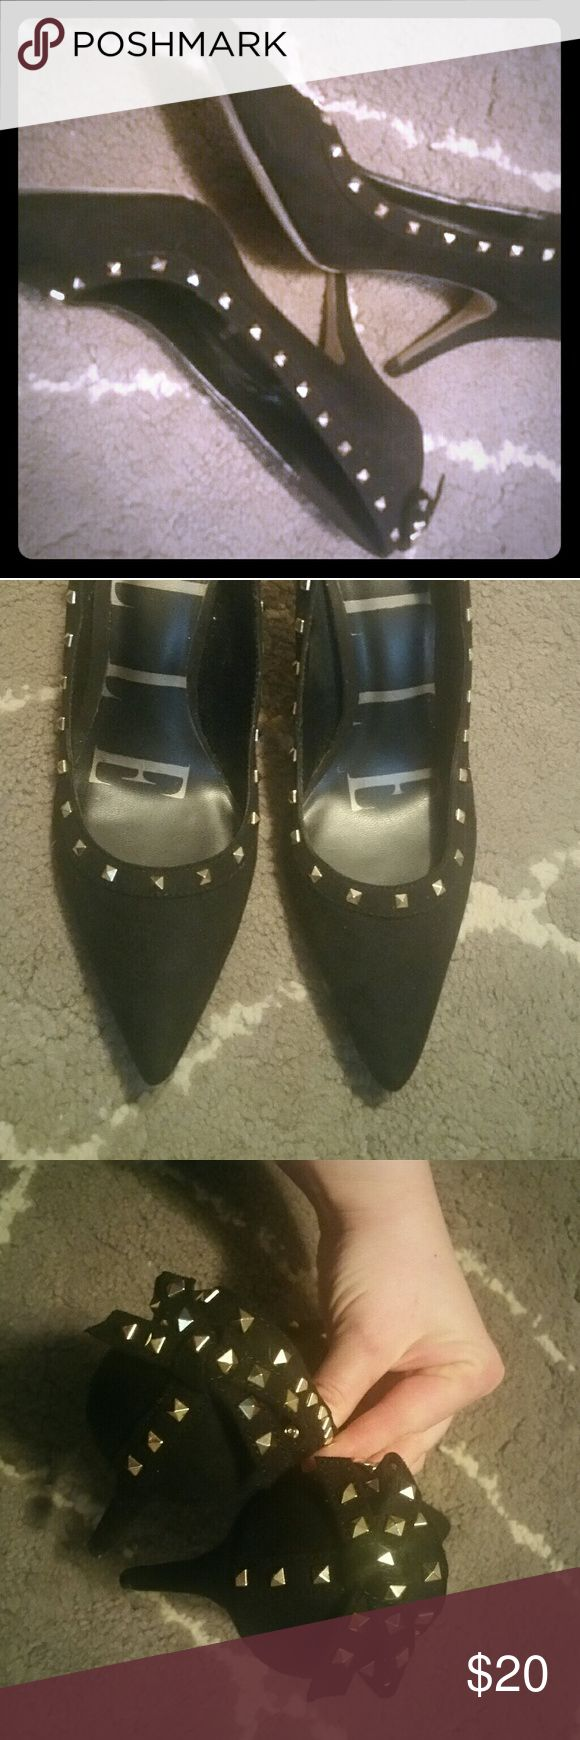 Elle Black & Gold Studded Velvet Pumps size 7.5 Cute black velvet pumps with gold studs and bows on heels. Elle Shoes Heels